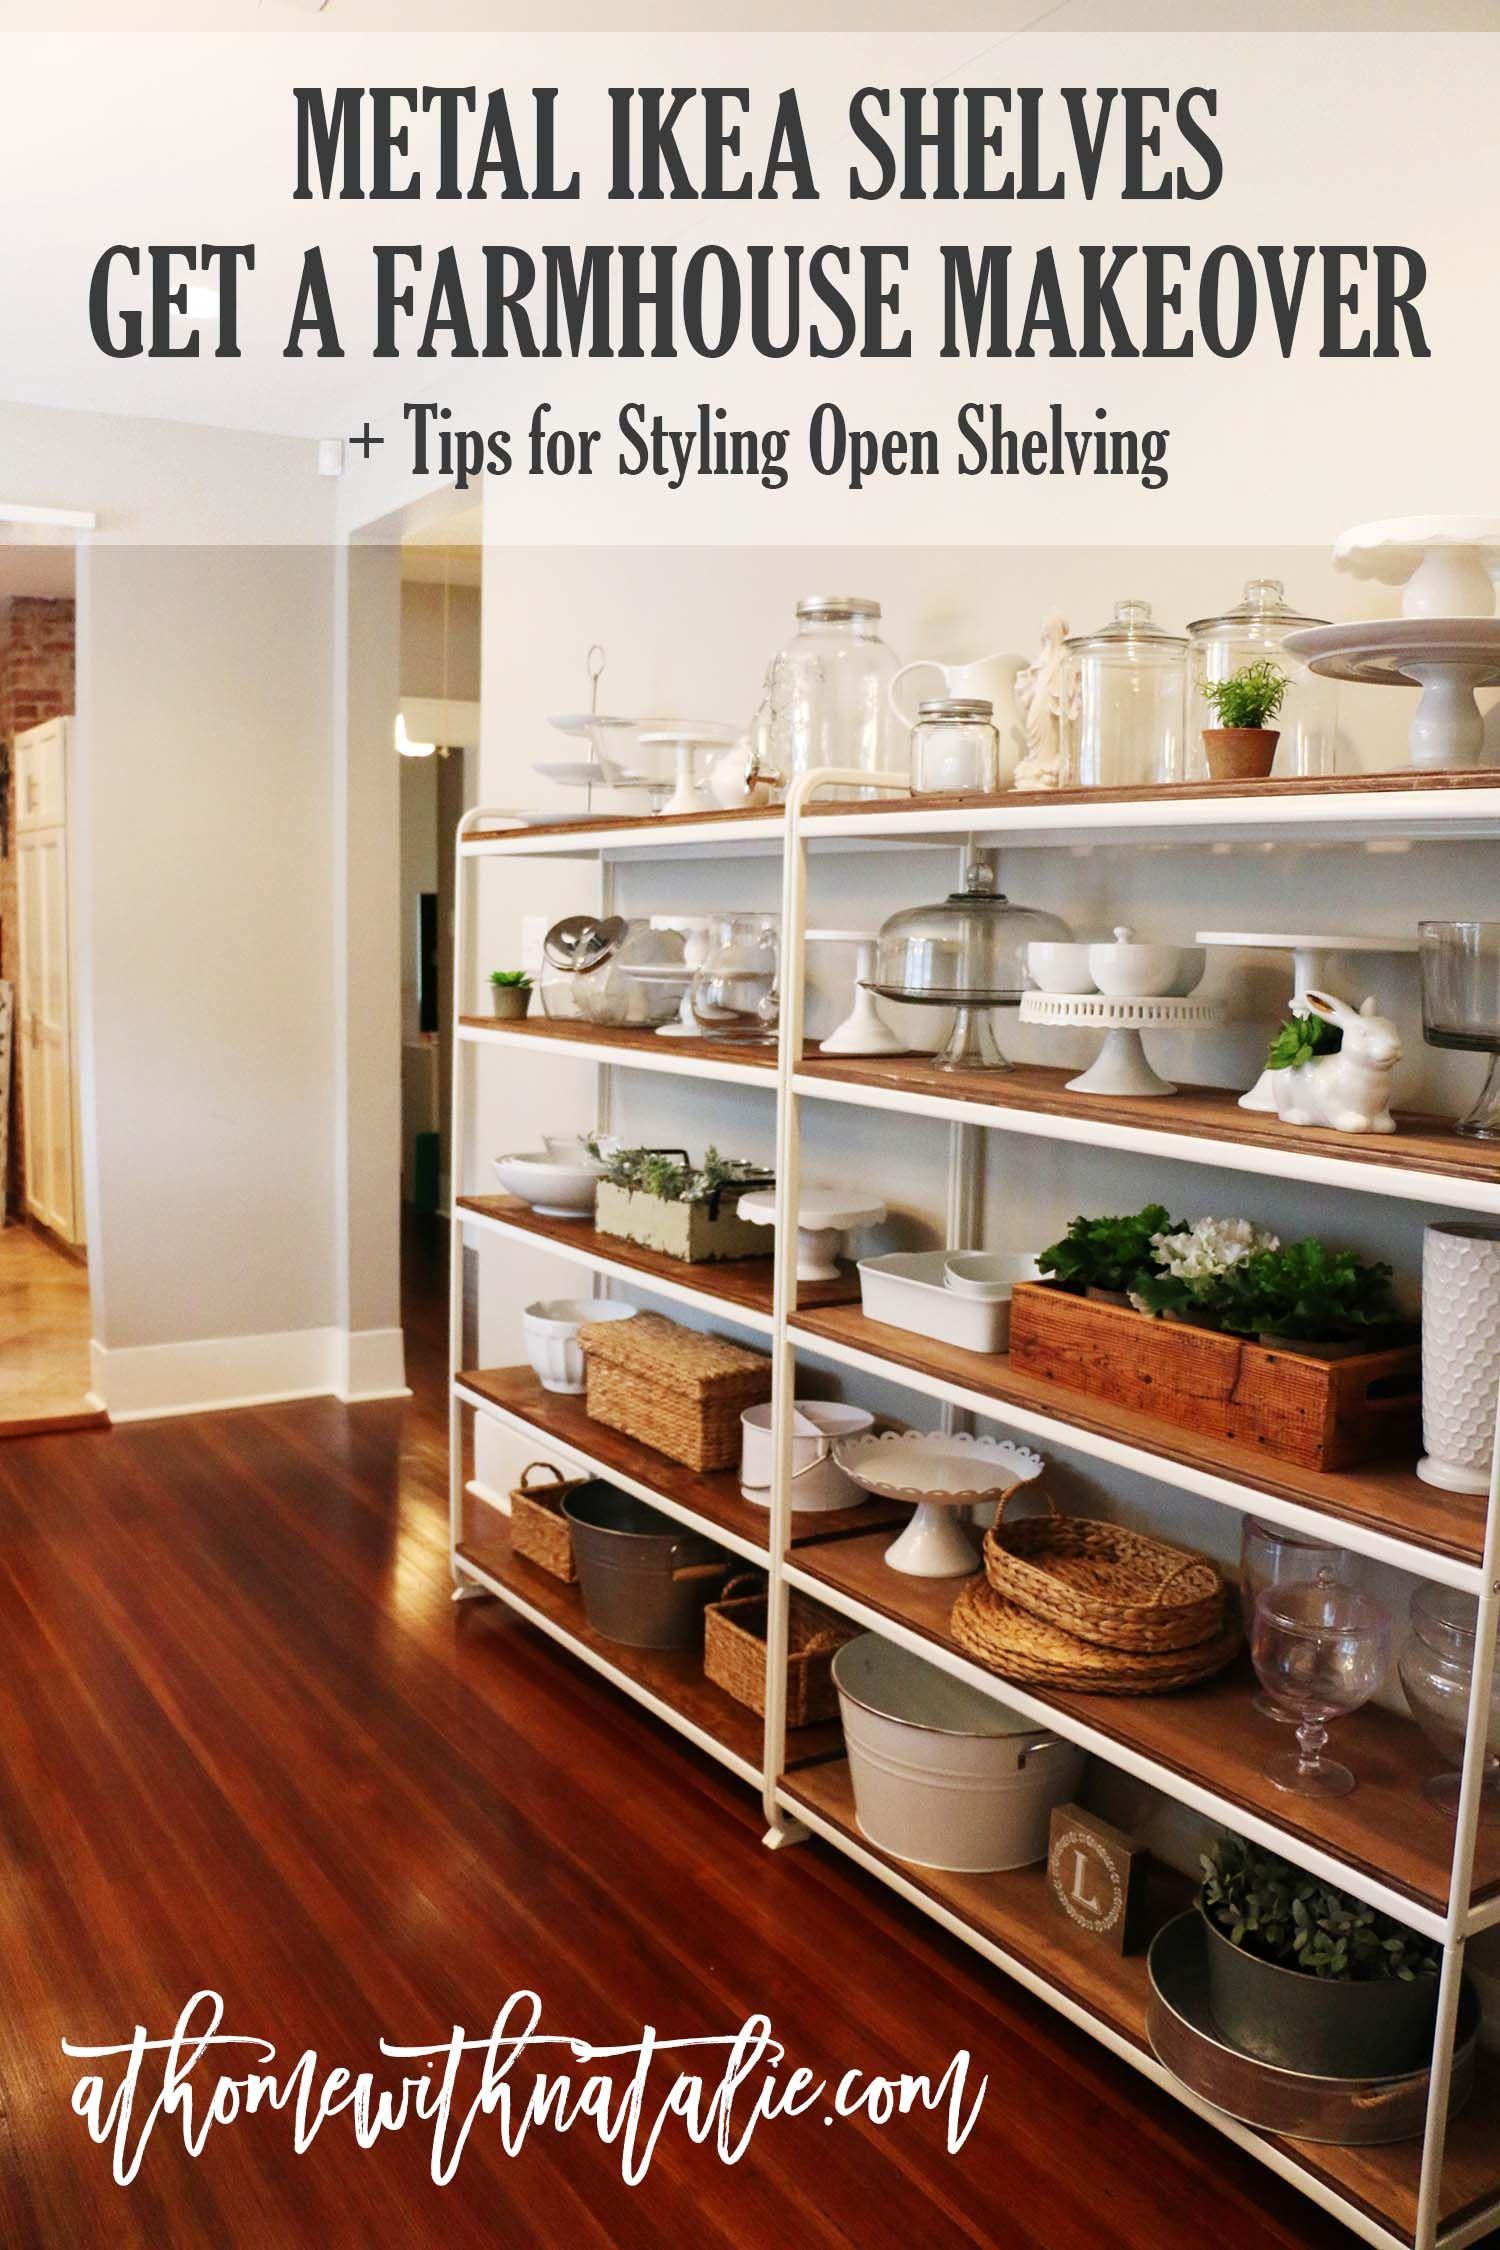 Metal Ikea Shelves Get Farmhouse